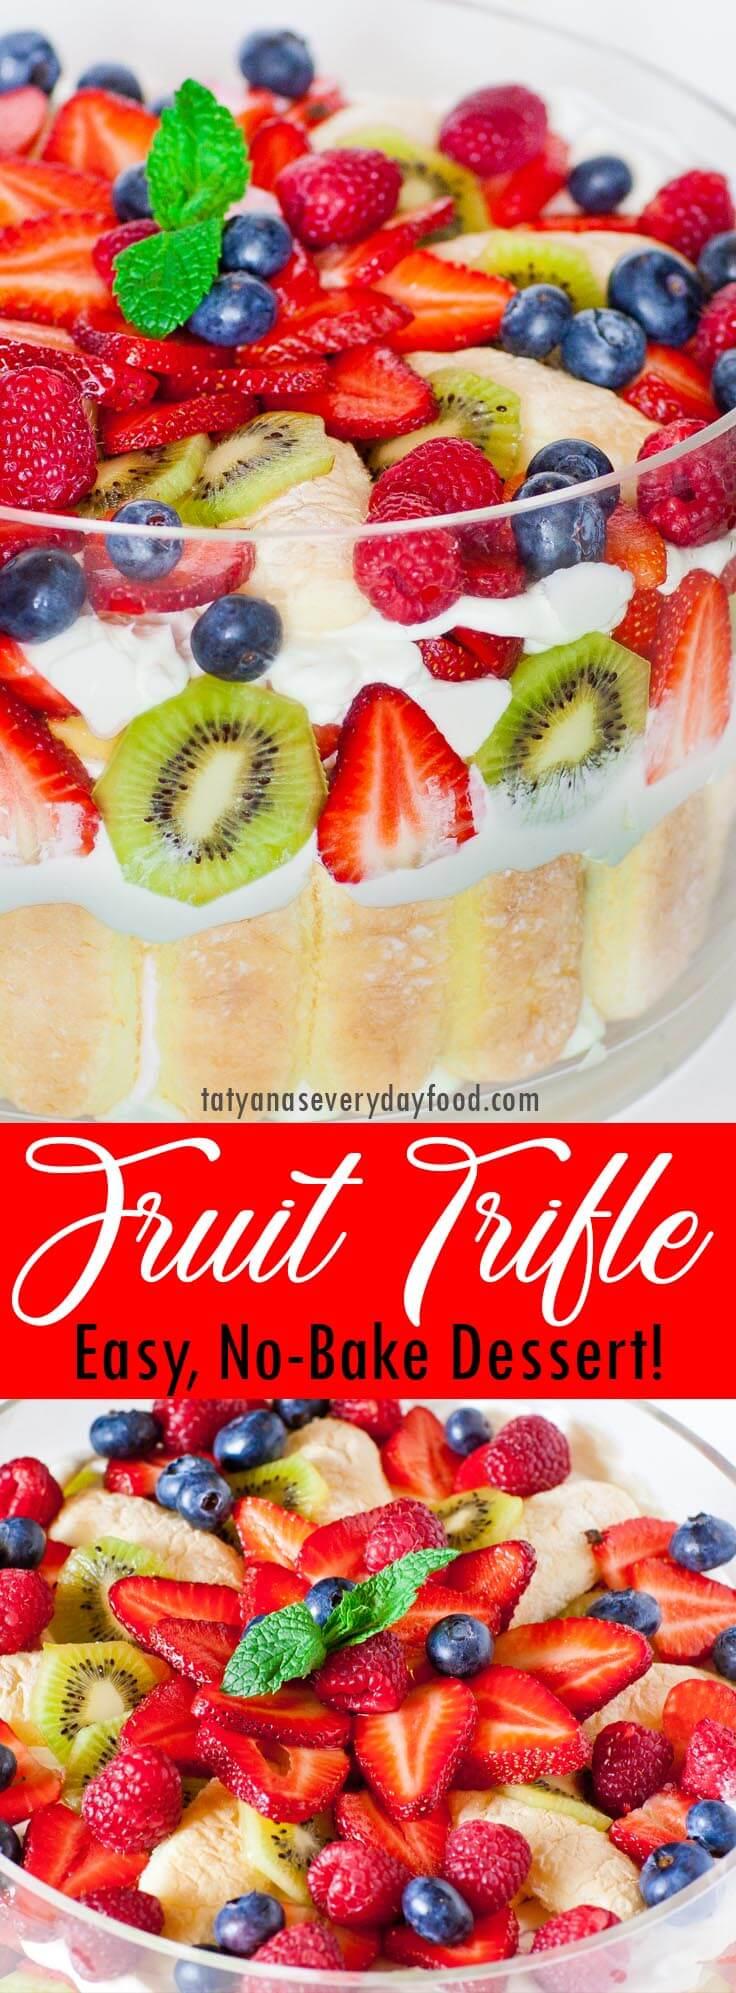 Easy Fruit Trifle video recipe